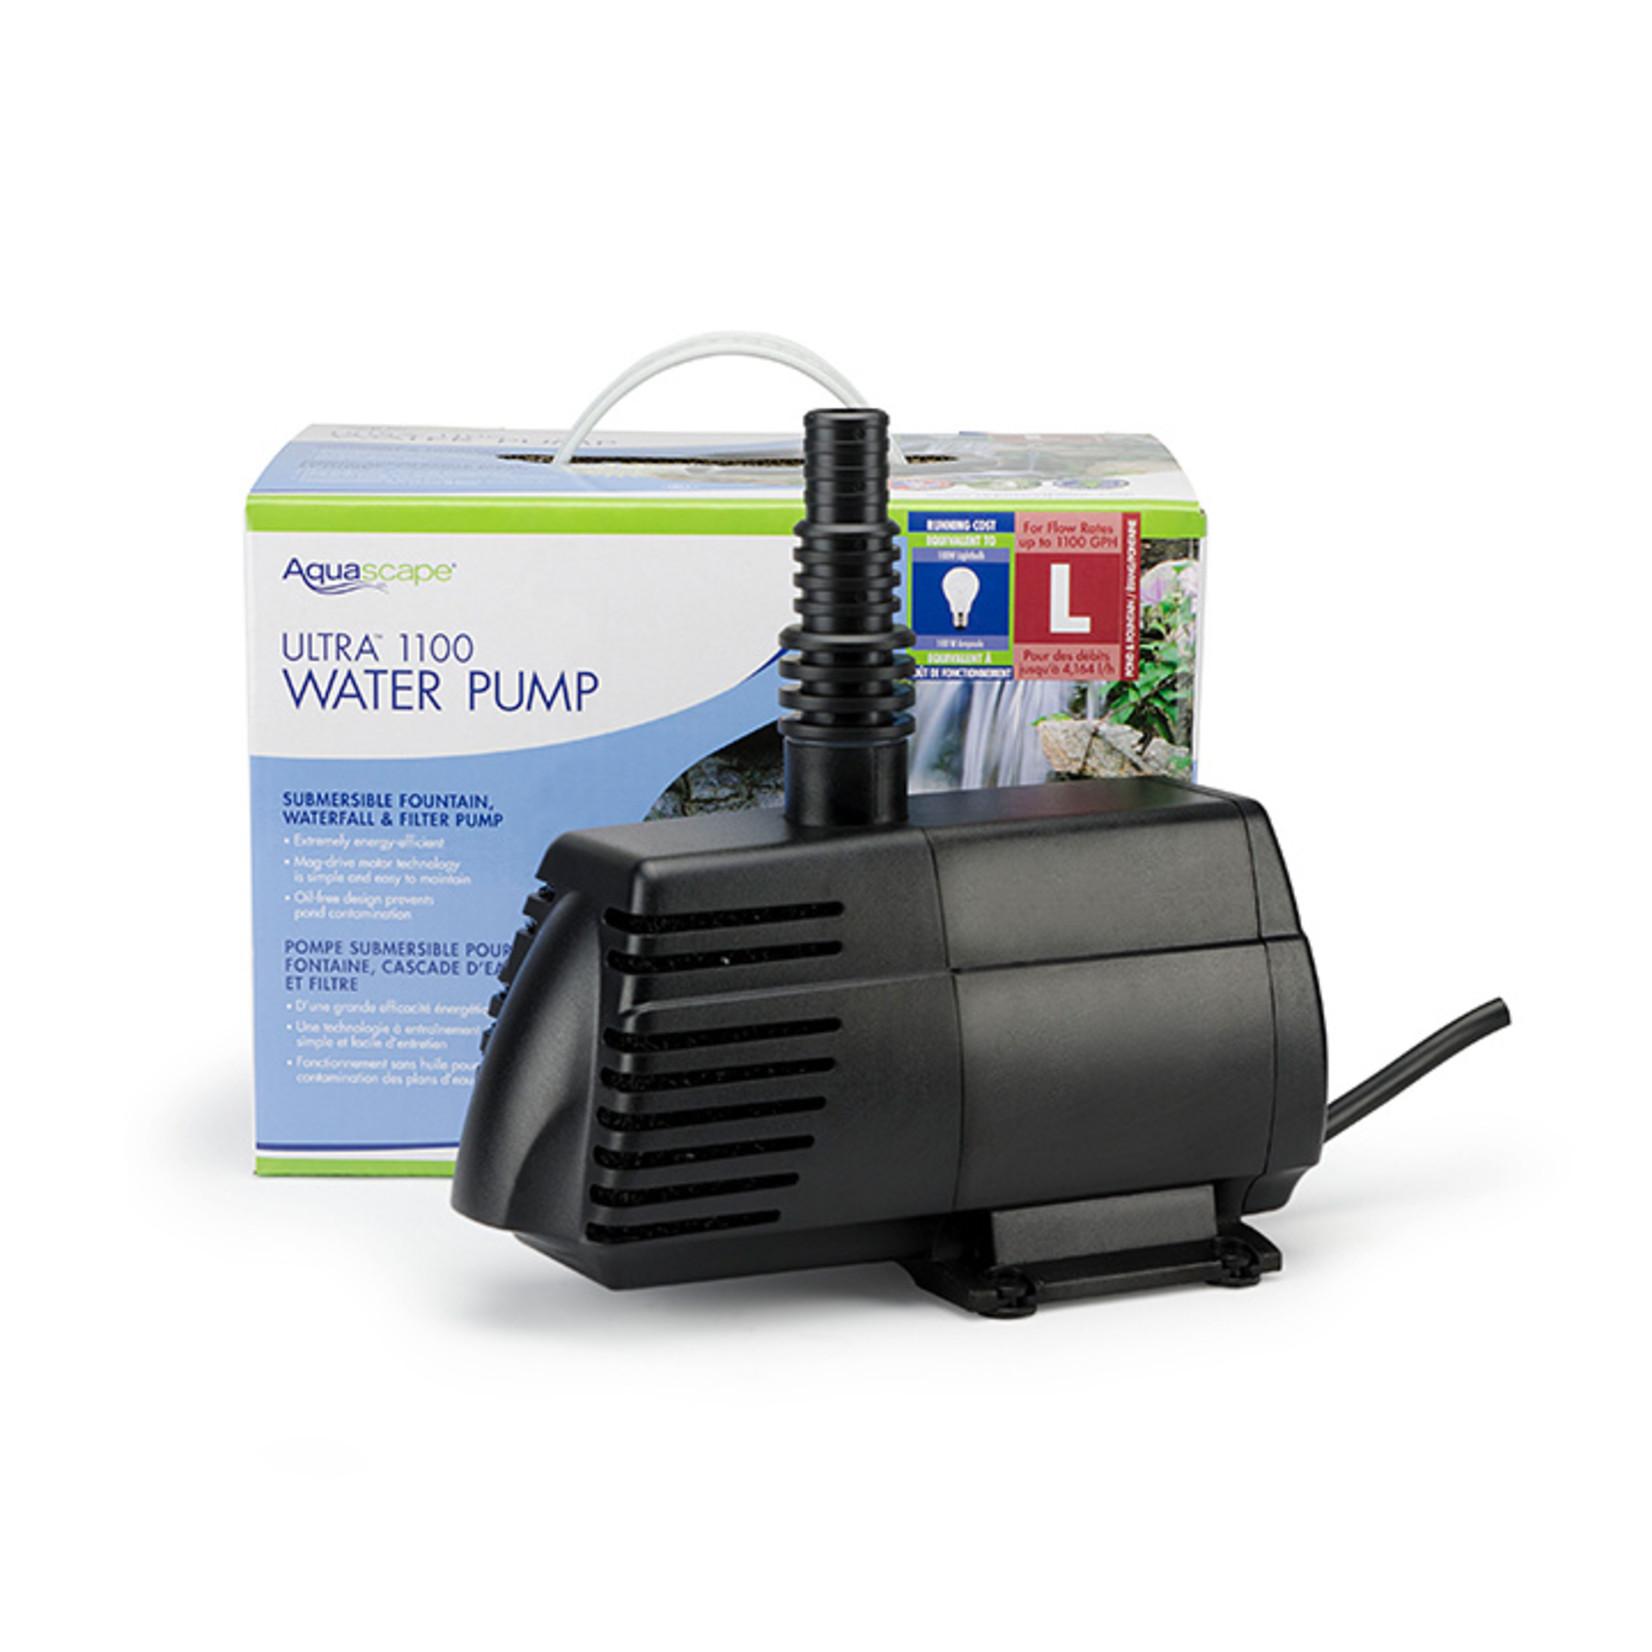 Aquascape Pompe D'Eau Ultra 1100